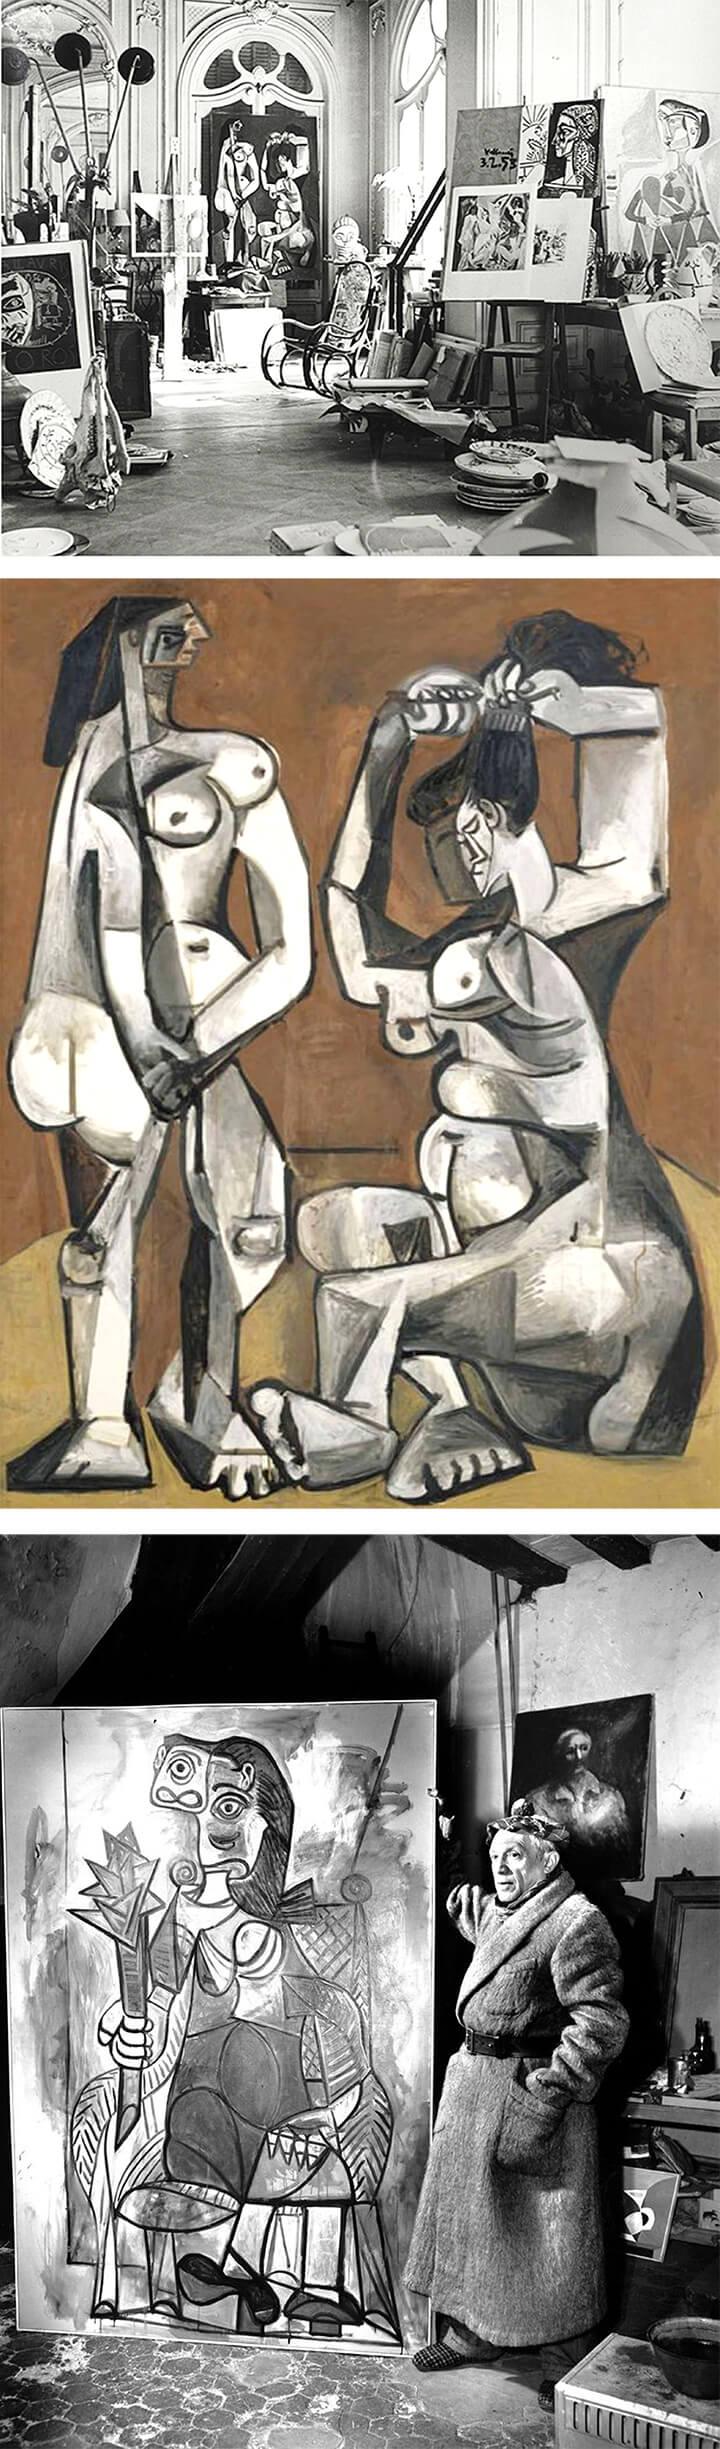 Art Pablo Picasso